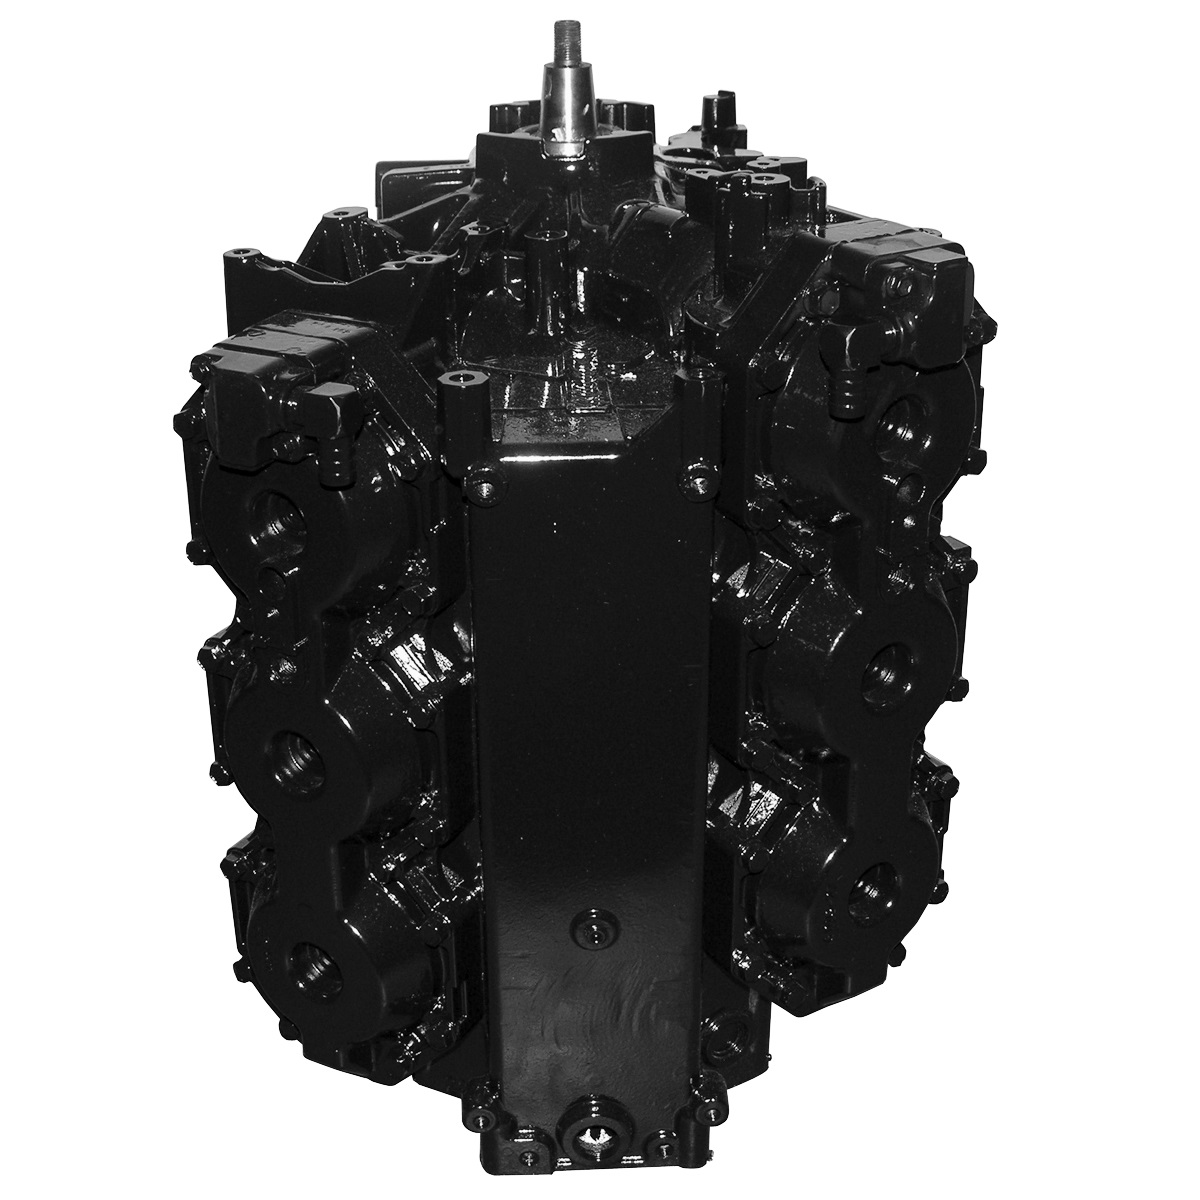 category merc 6 cyl powerheads jpg [ 1200 x 1200 Pixel ]